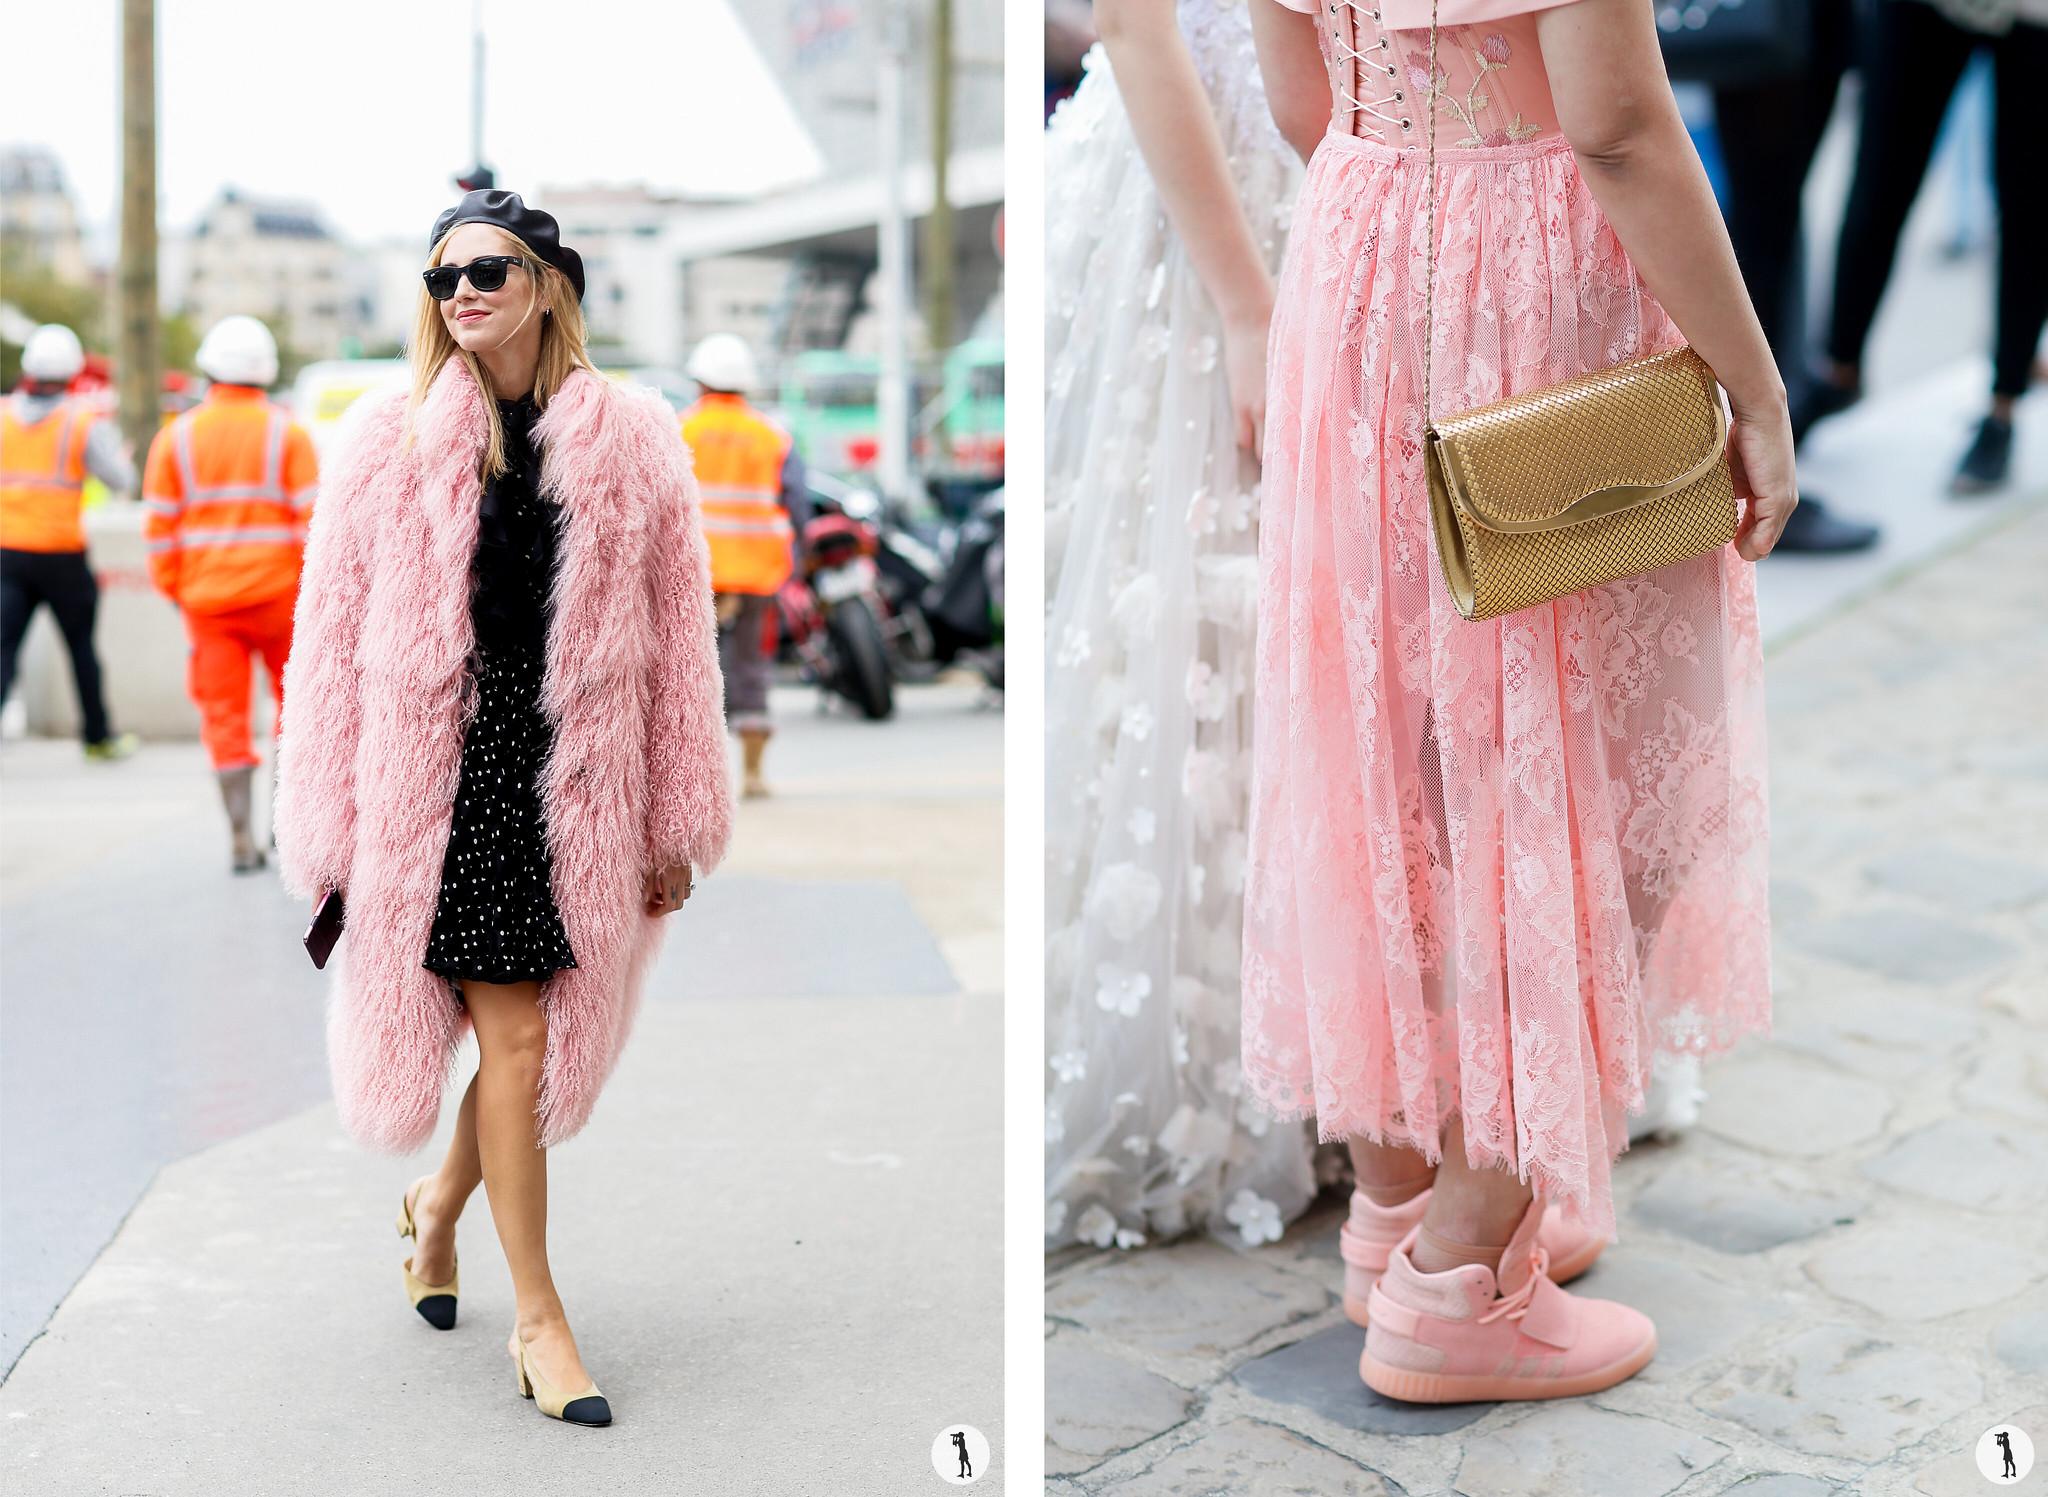 Chiara Ferragni and Close up - Paris Fashion Week SS18